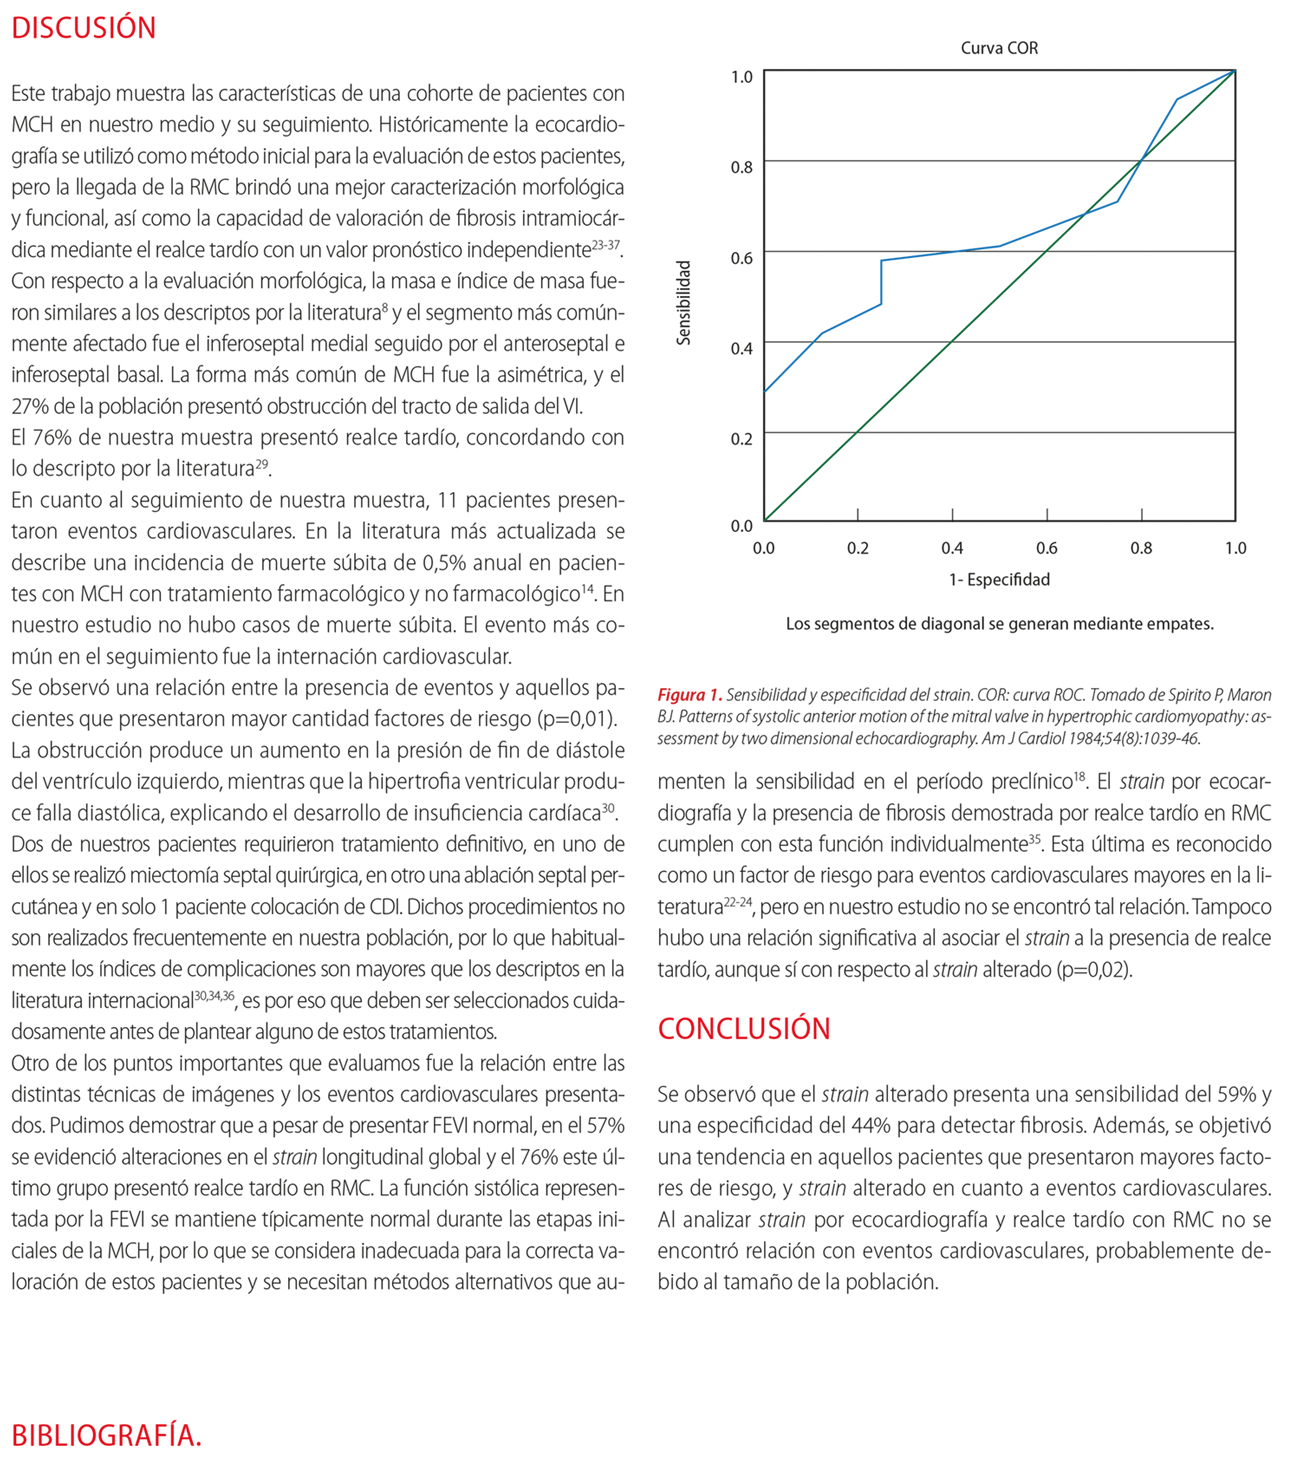 Miocardiopatía hipertrófica: correlación entre hallazgos por resonancia magnética cardíaca, ecocardiograma Doppler y eventos cardiovasculares